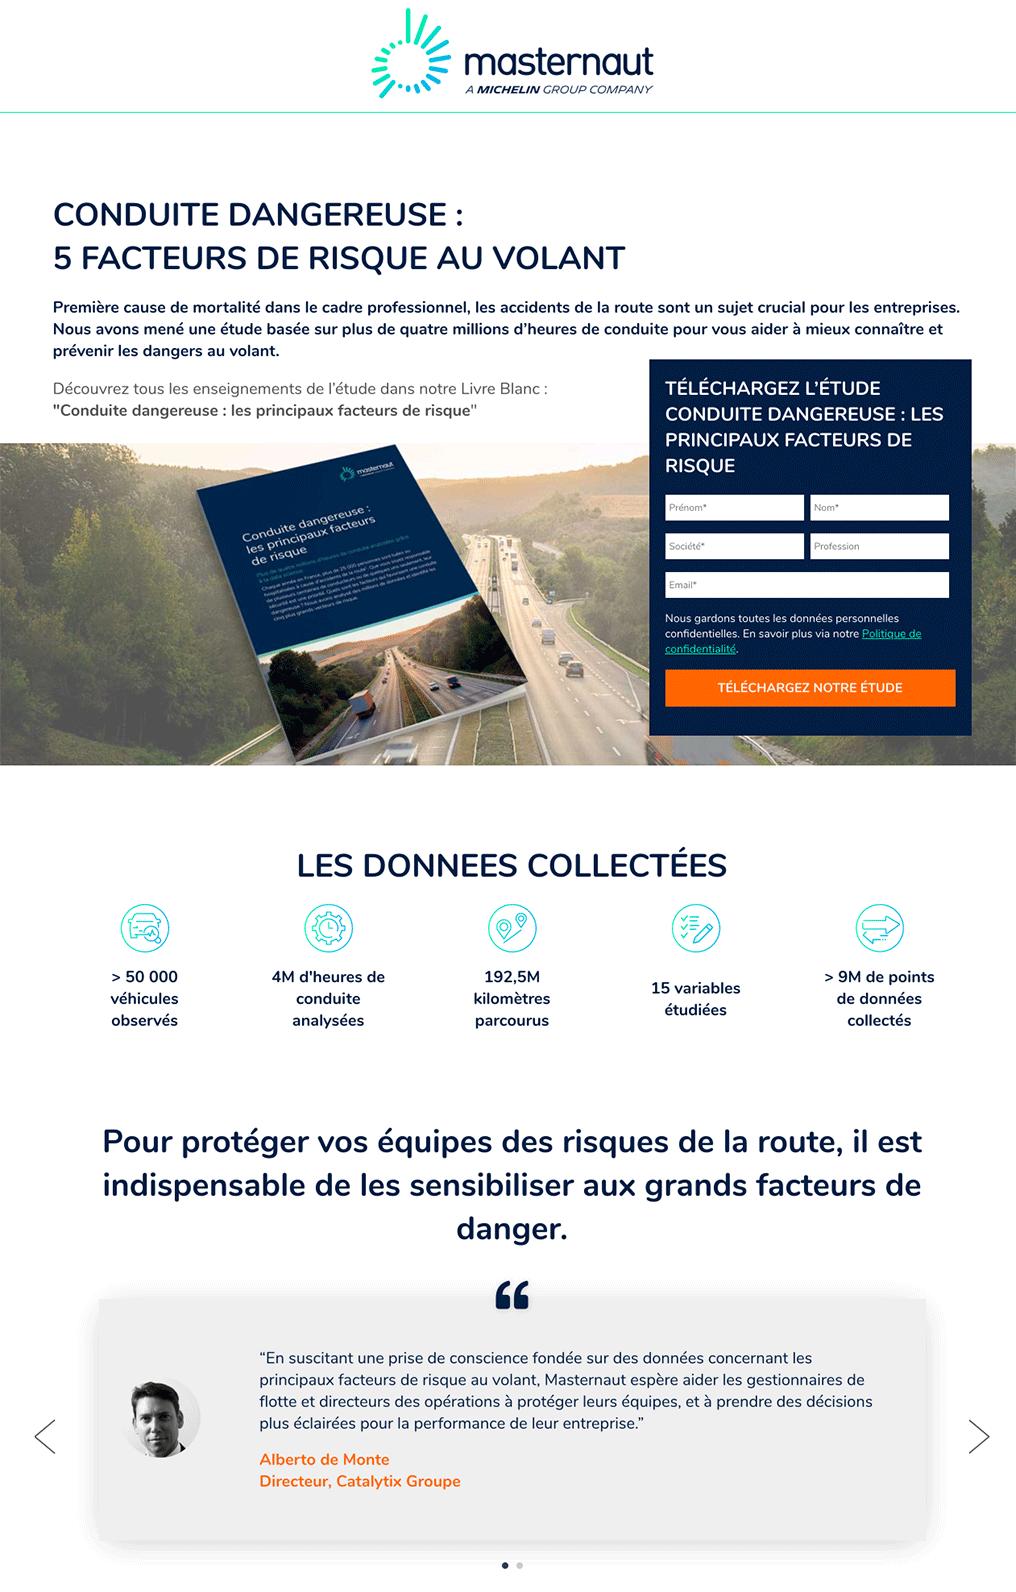 Formation marketing digital : exemple de landing page avec HubSpot